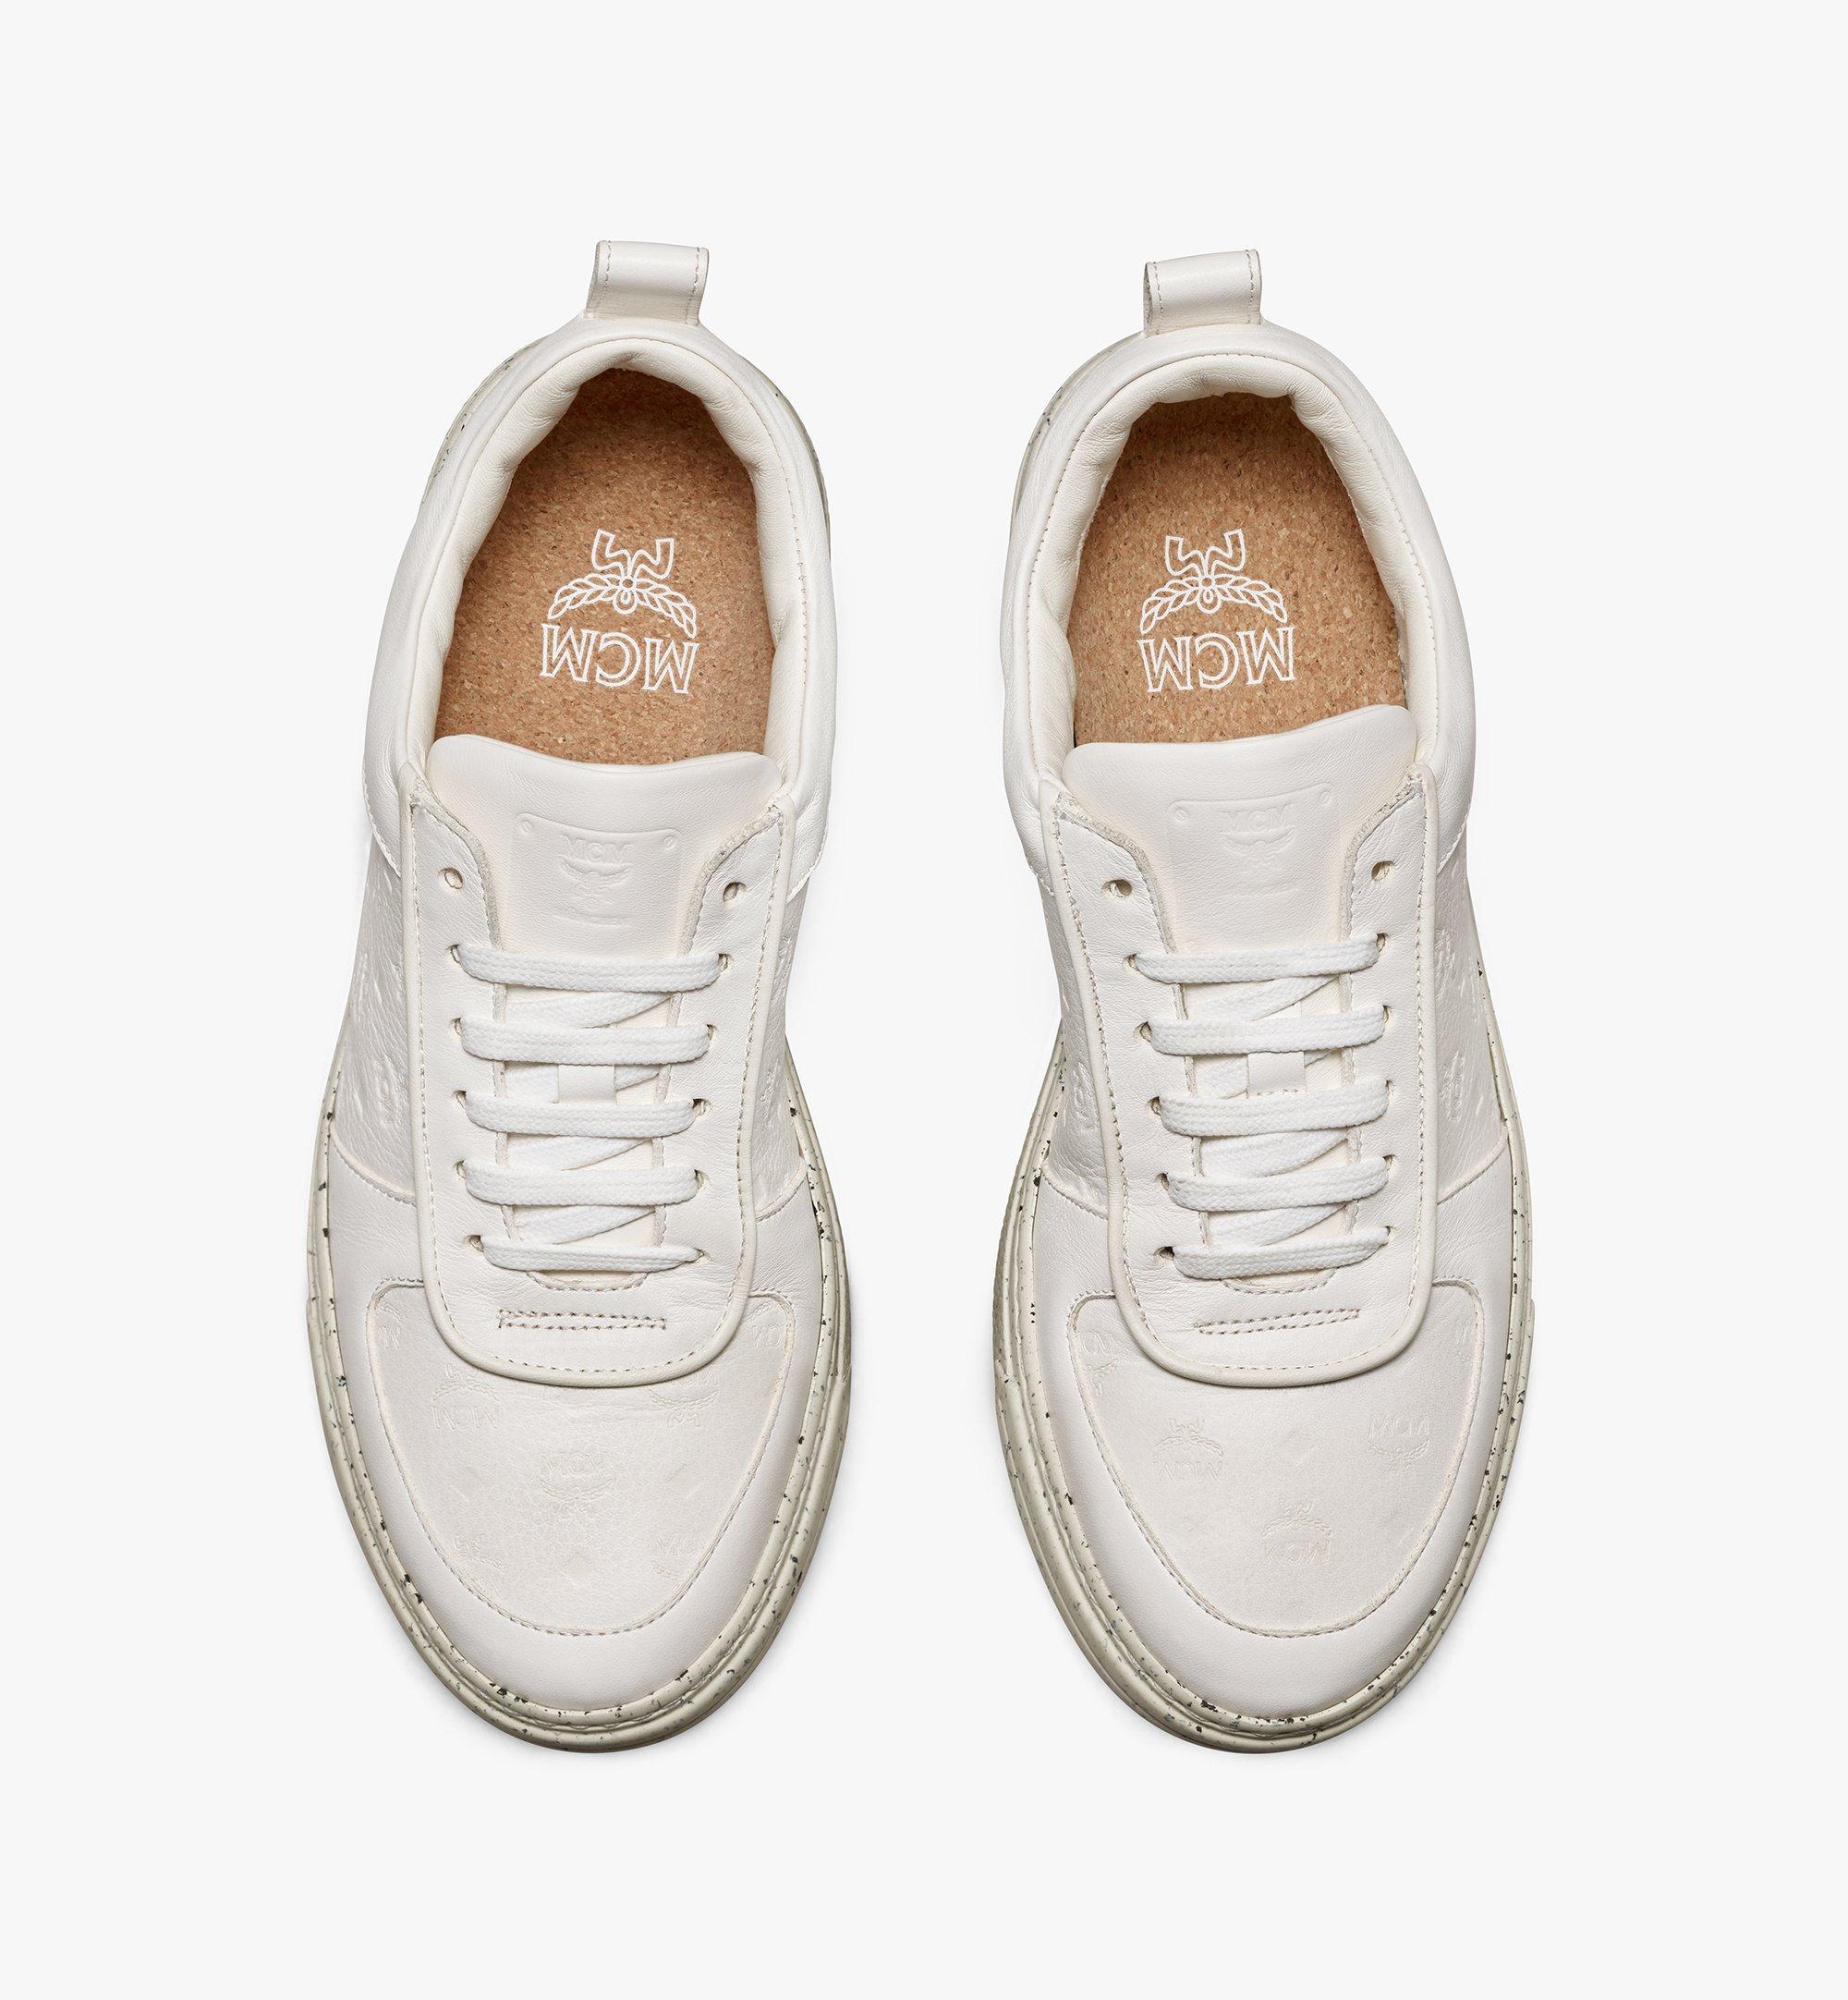 MCM รองเท้าผ้าใบสำหรับผู้หญิง Terrain Lo ผลิตจากวัสดุที่ยั่งยืน White MESAAMM18WT036 มุมมองอื่น 4